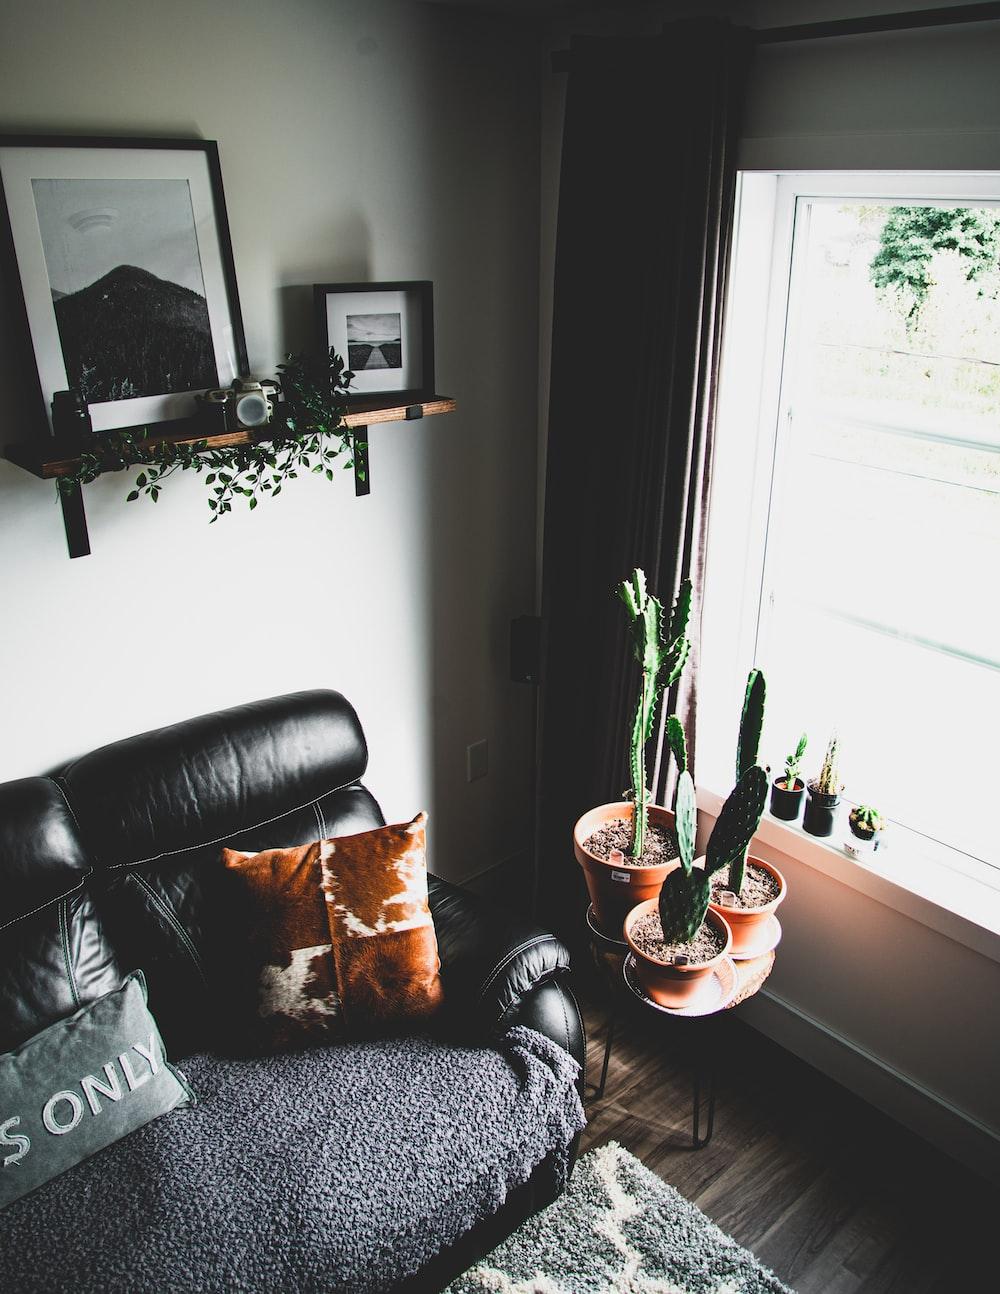 brown throw pillow on black sofa beside green cactus plants